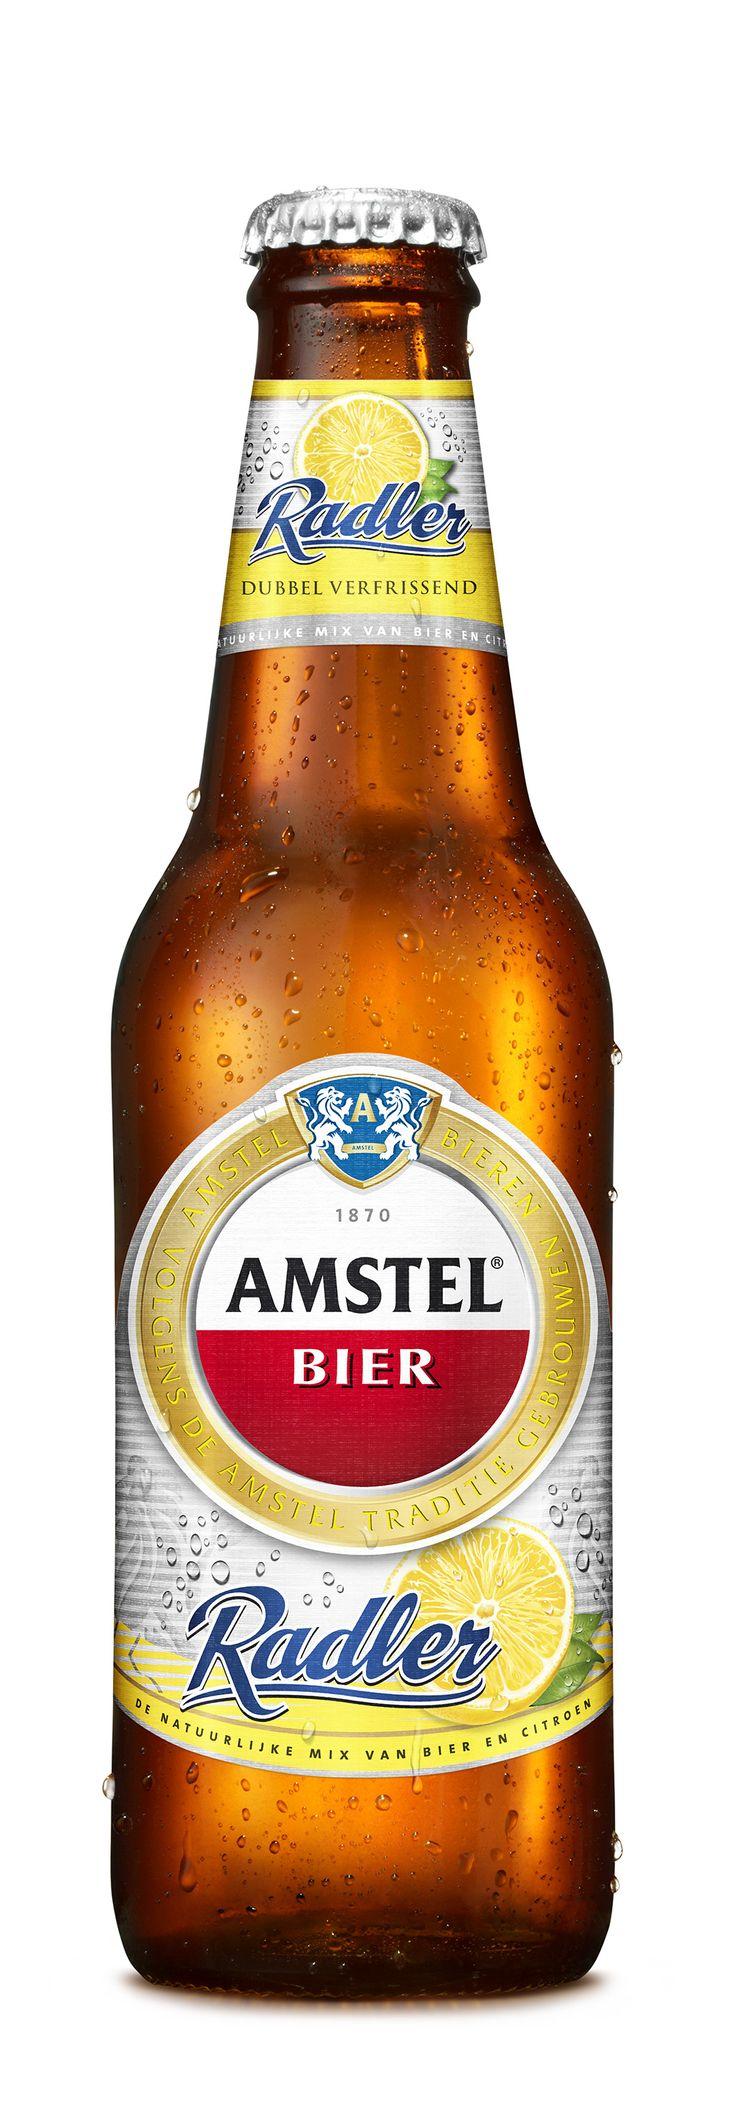 Amstel Radler......mi compañera del verano 2014!!!!!